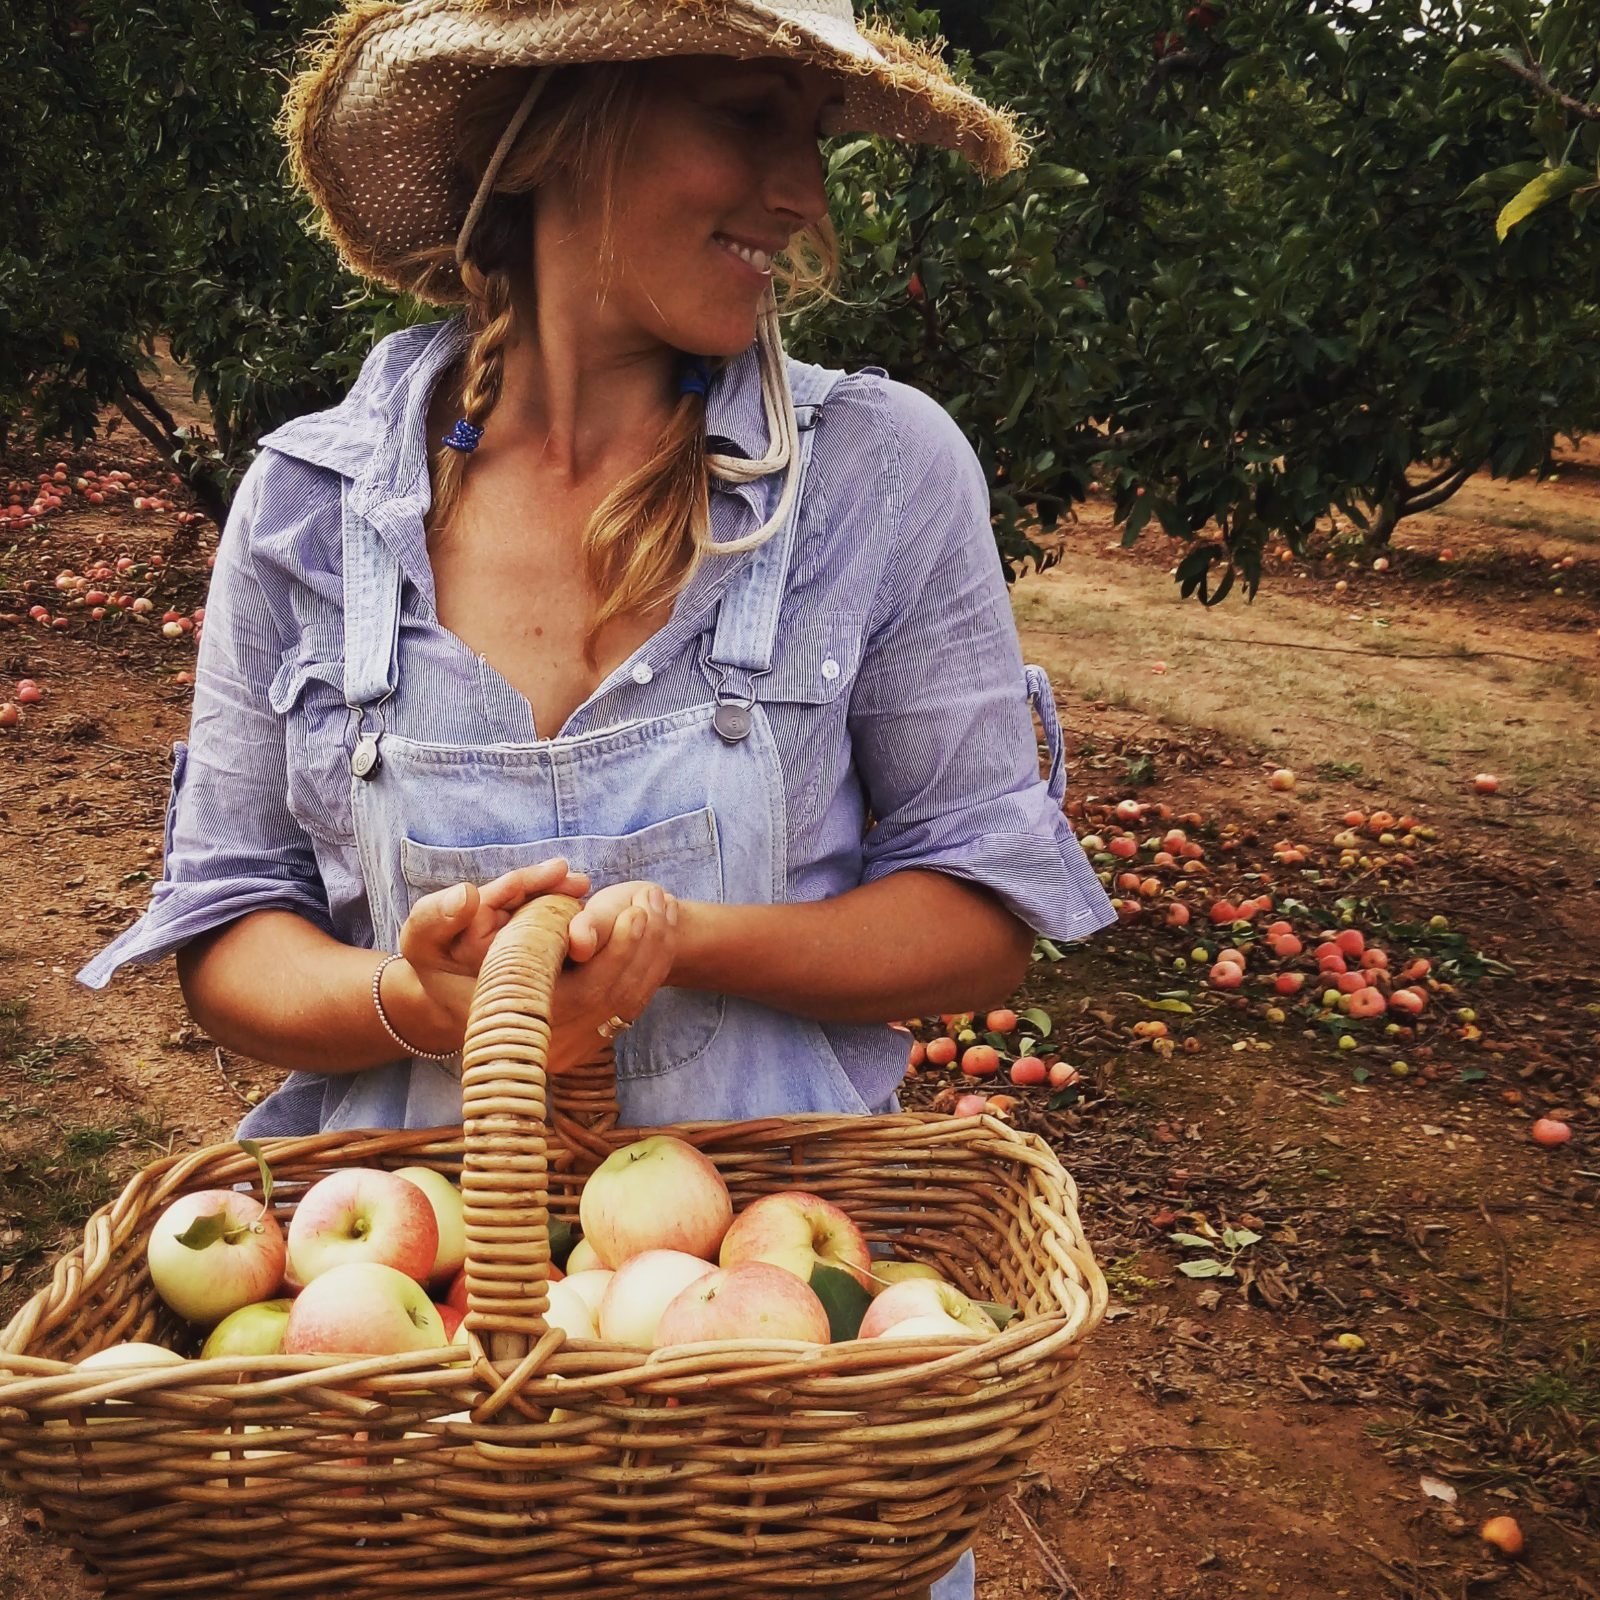 Black Barn Farm - Pick Your Own Apples